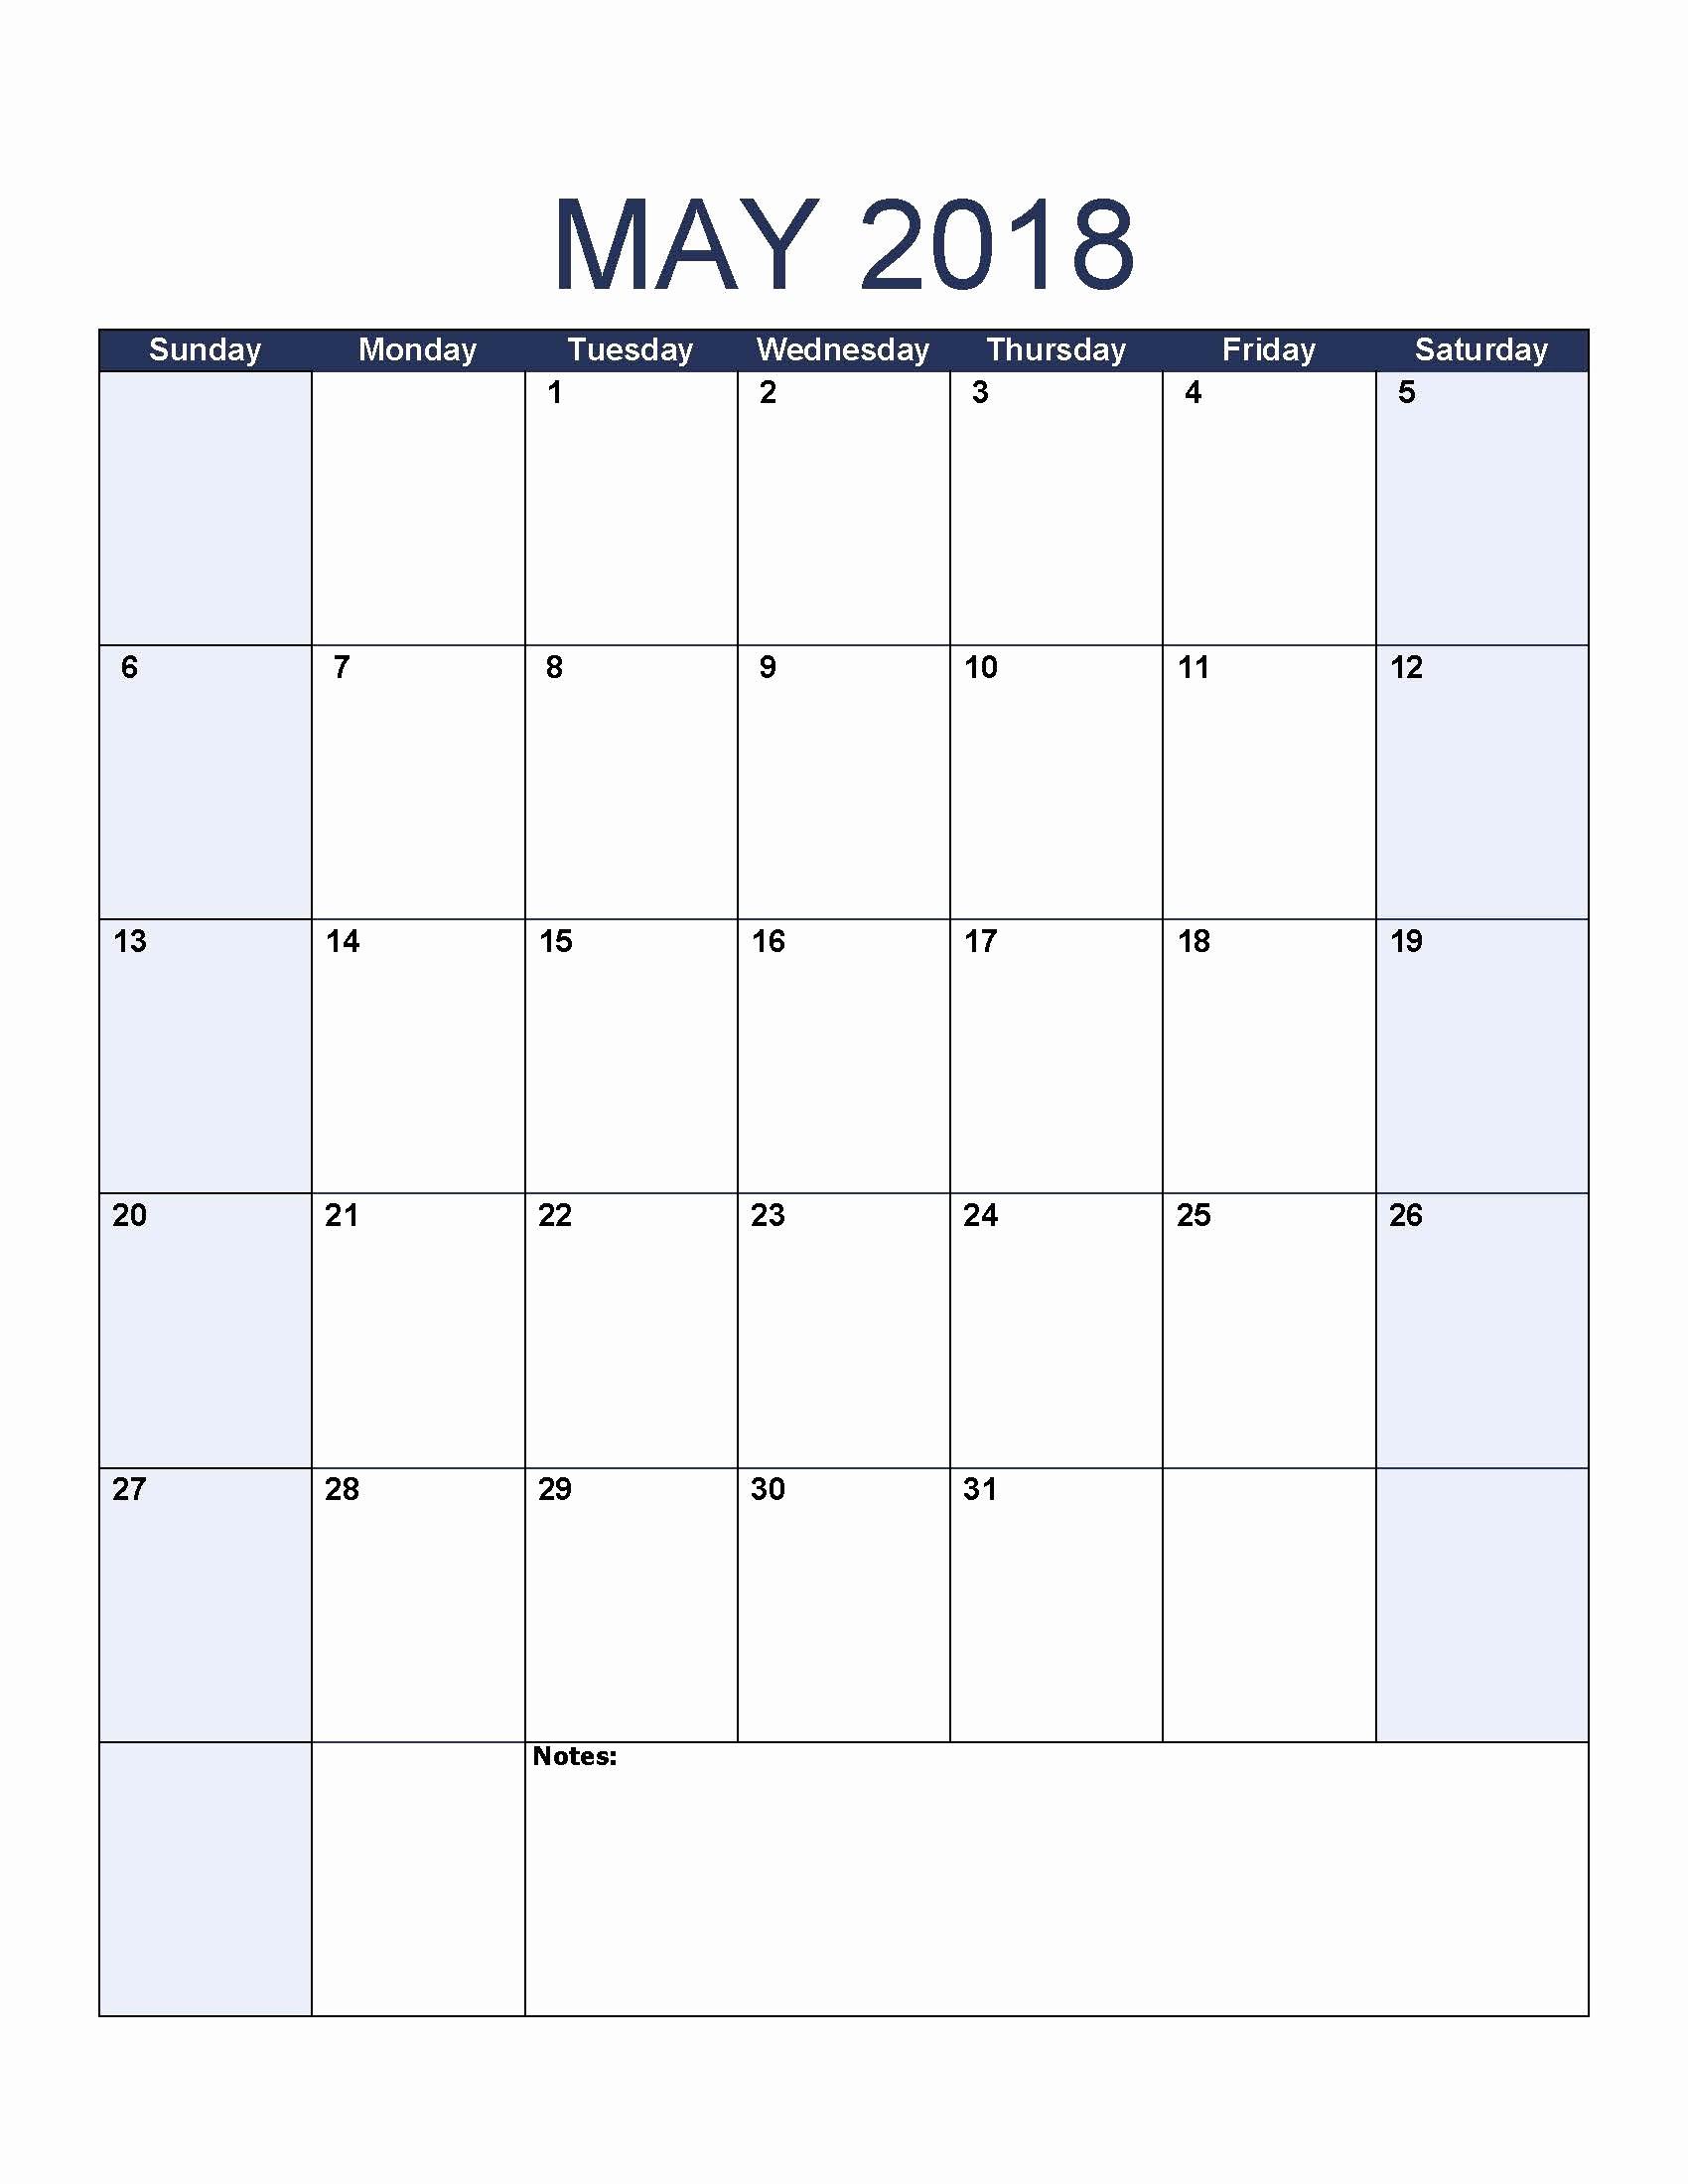 Microsoft Word Calendar Template 2018 Elegant Printable May 2018 Calendar Word